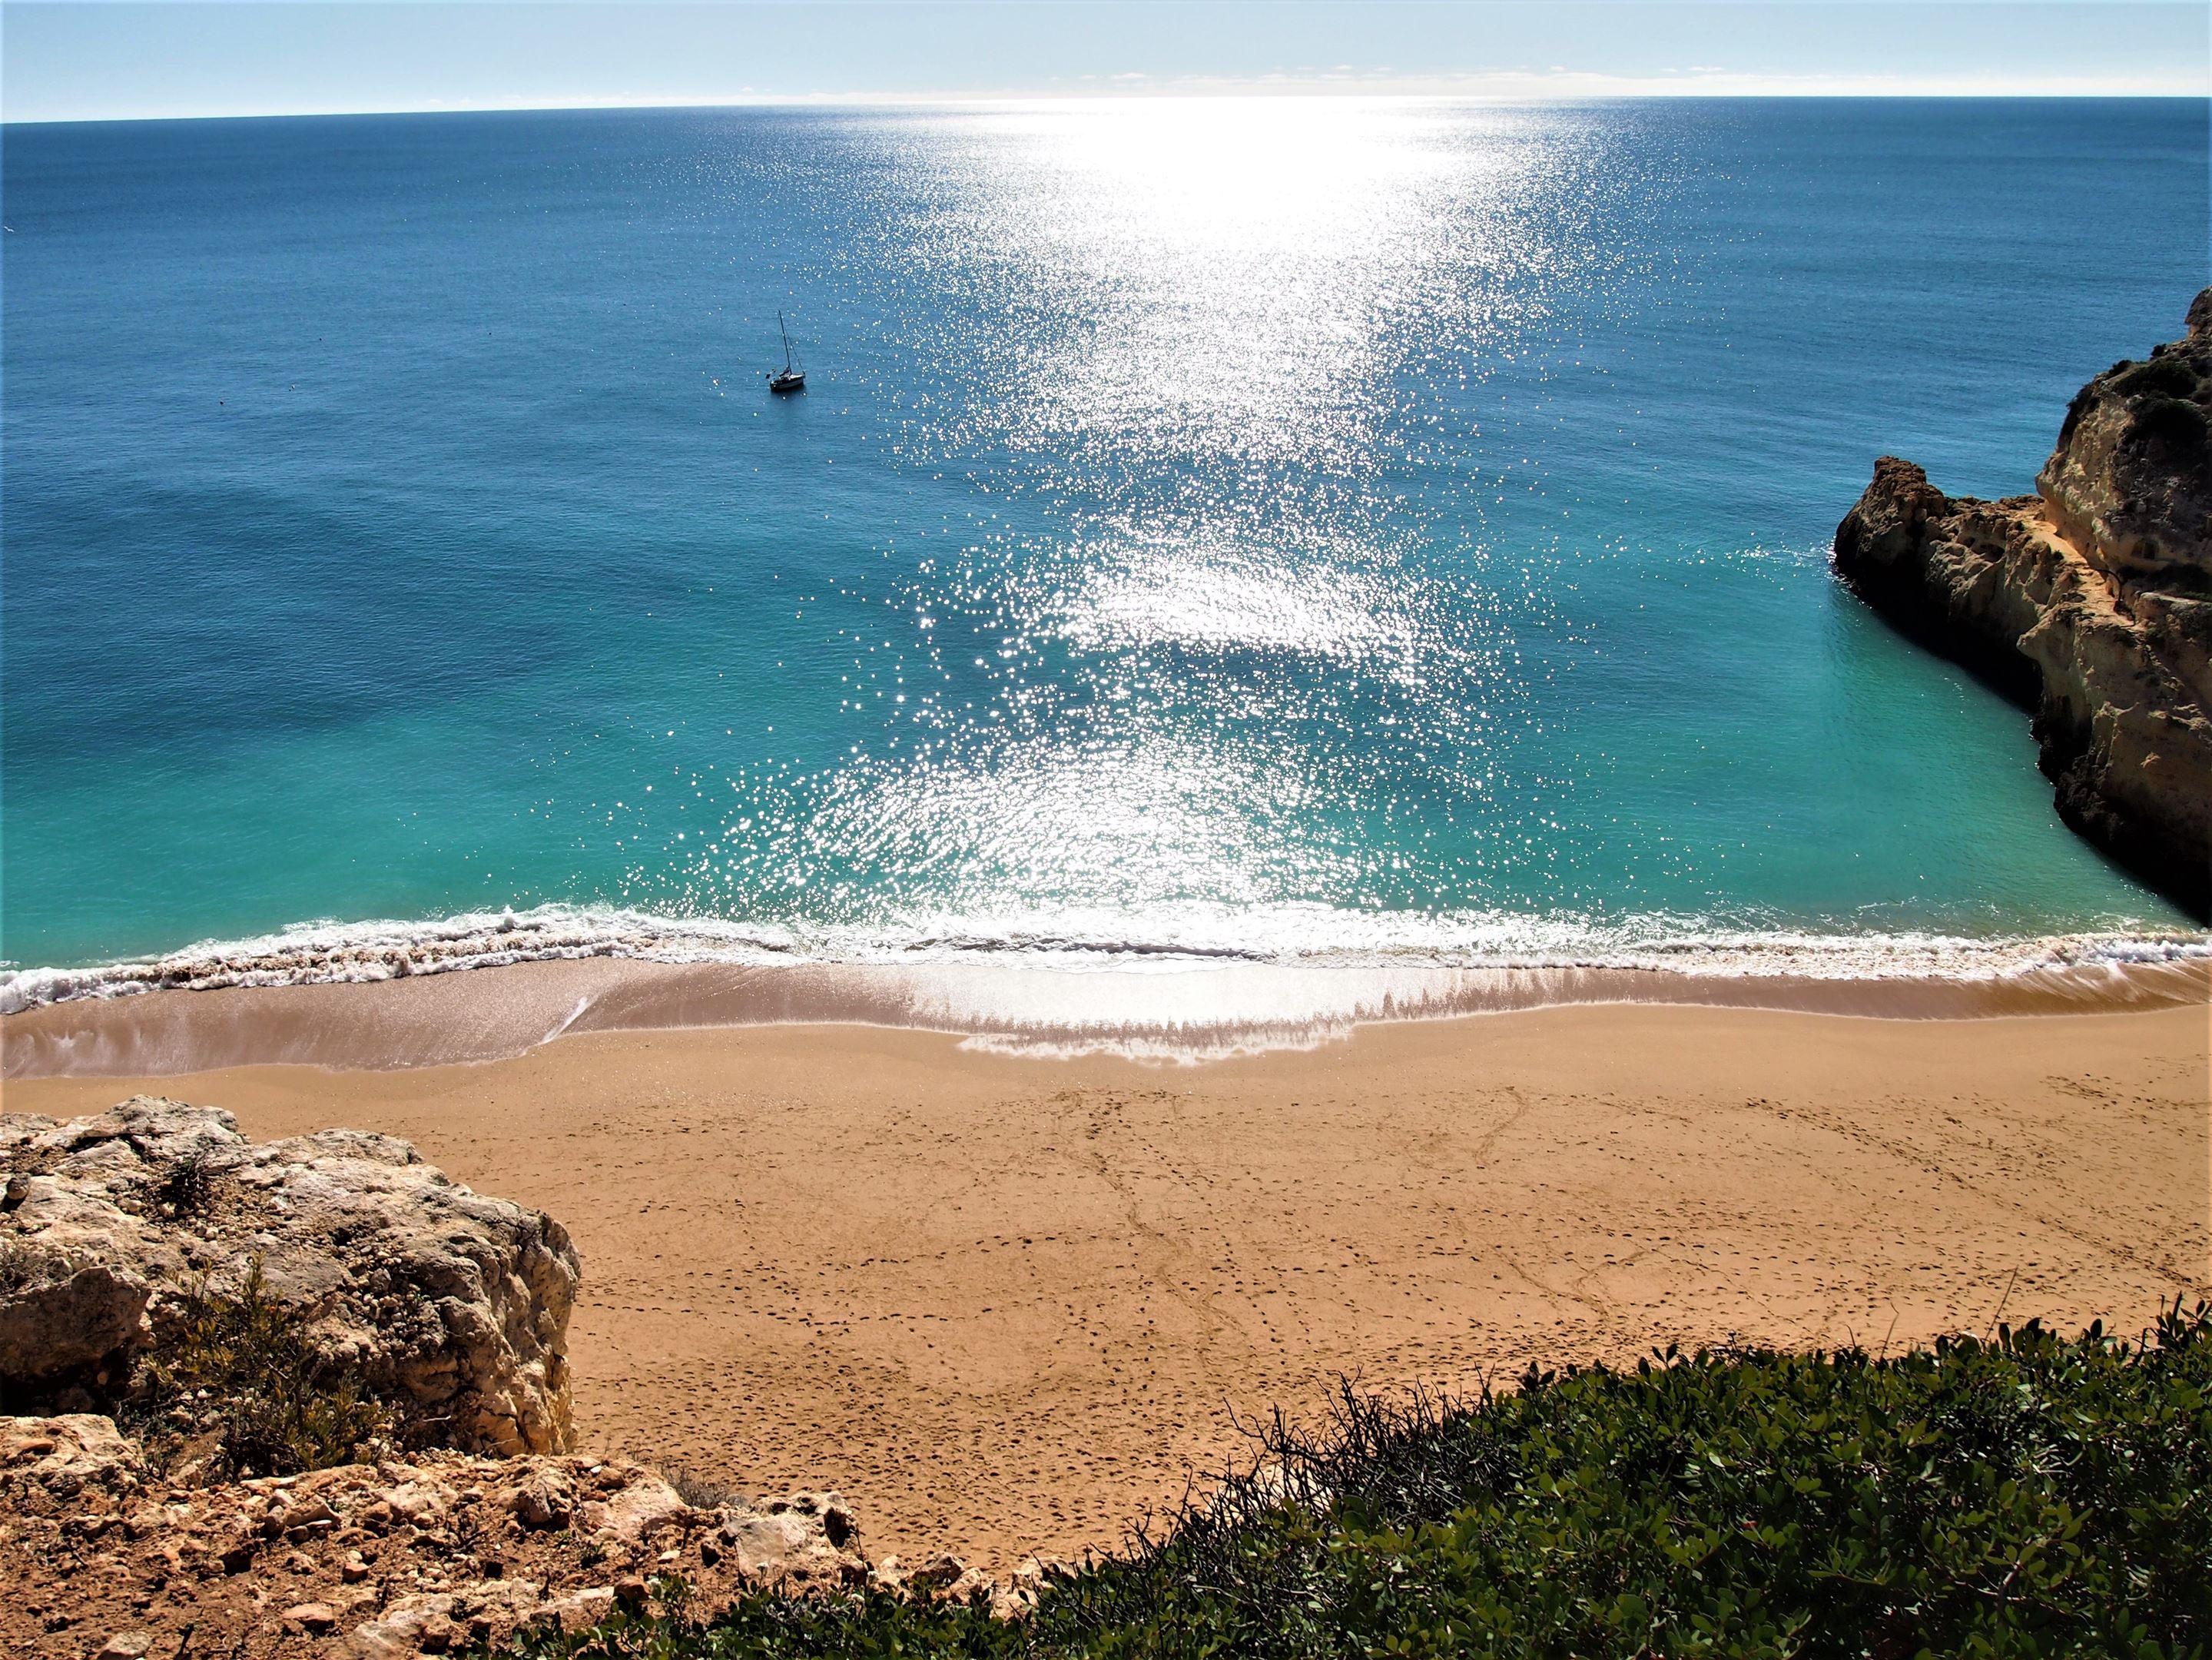 Vista para a Praia de Benagil - a partir  do Percurso dos Sete Vales Suspensos